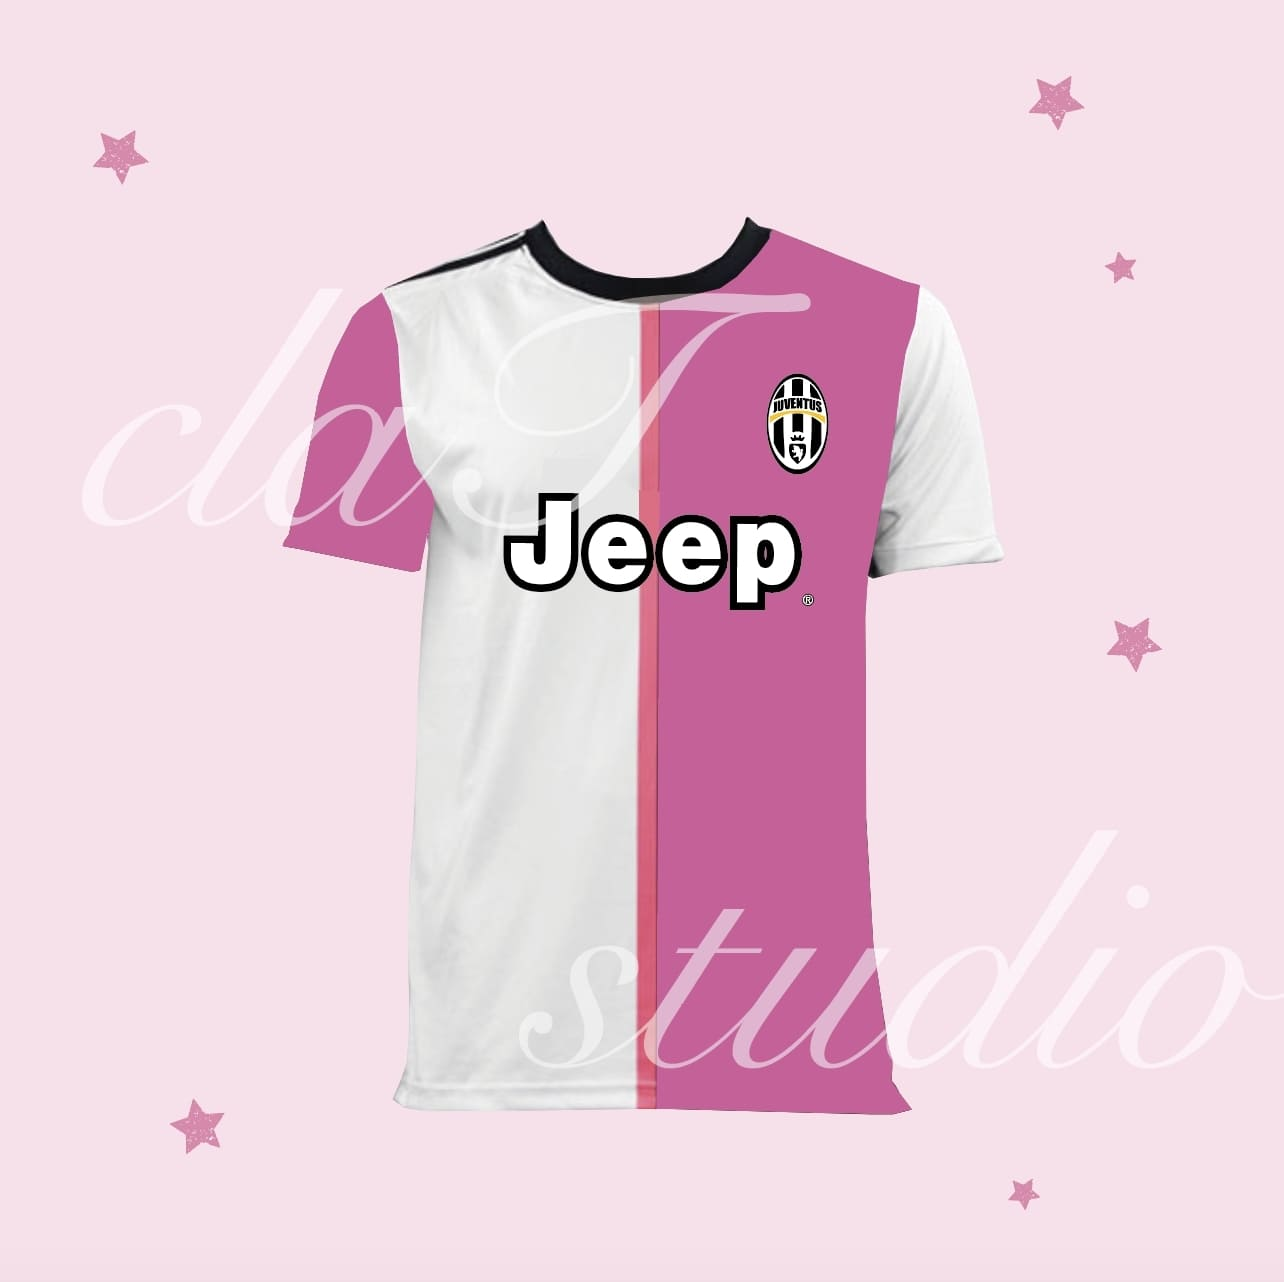 JEEP_image_0001